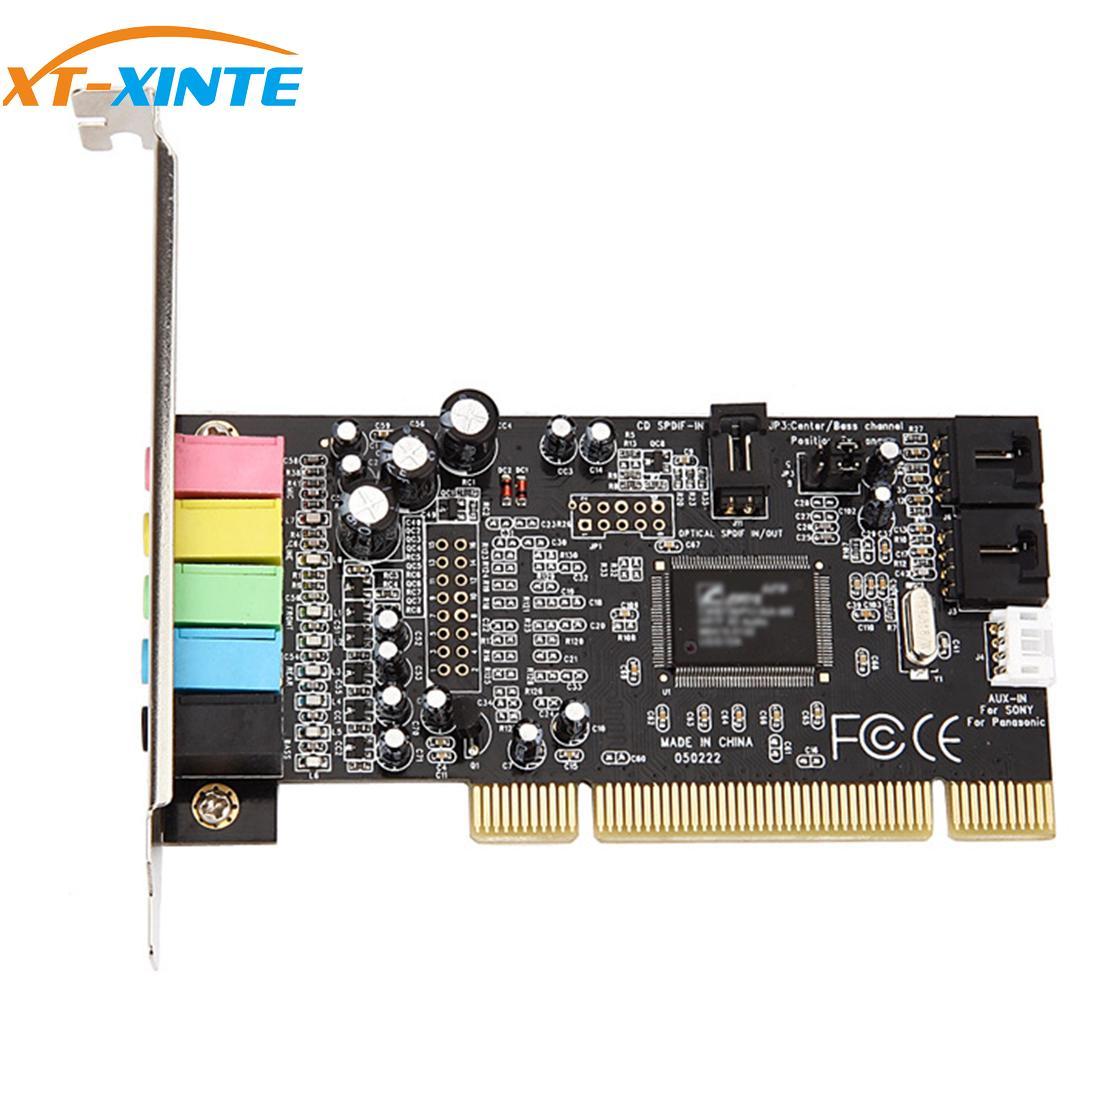 XT-XINTE PCI كارت الصوت 5.1CH 5.1 قناة CMI8738 شرائح جهاز التحكم في الصوت PCI-Express 5.1 ستيريو بطاقة رقمية سطح المكتب Soundcard